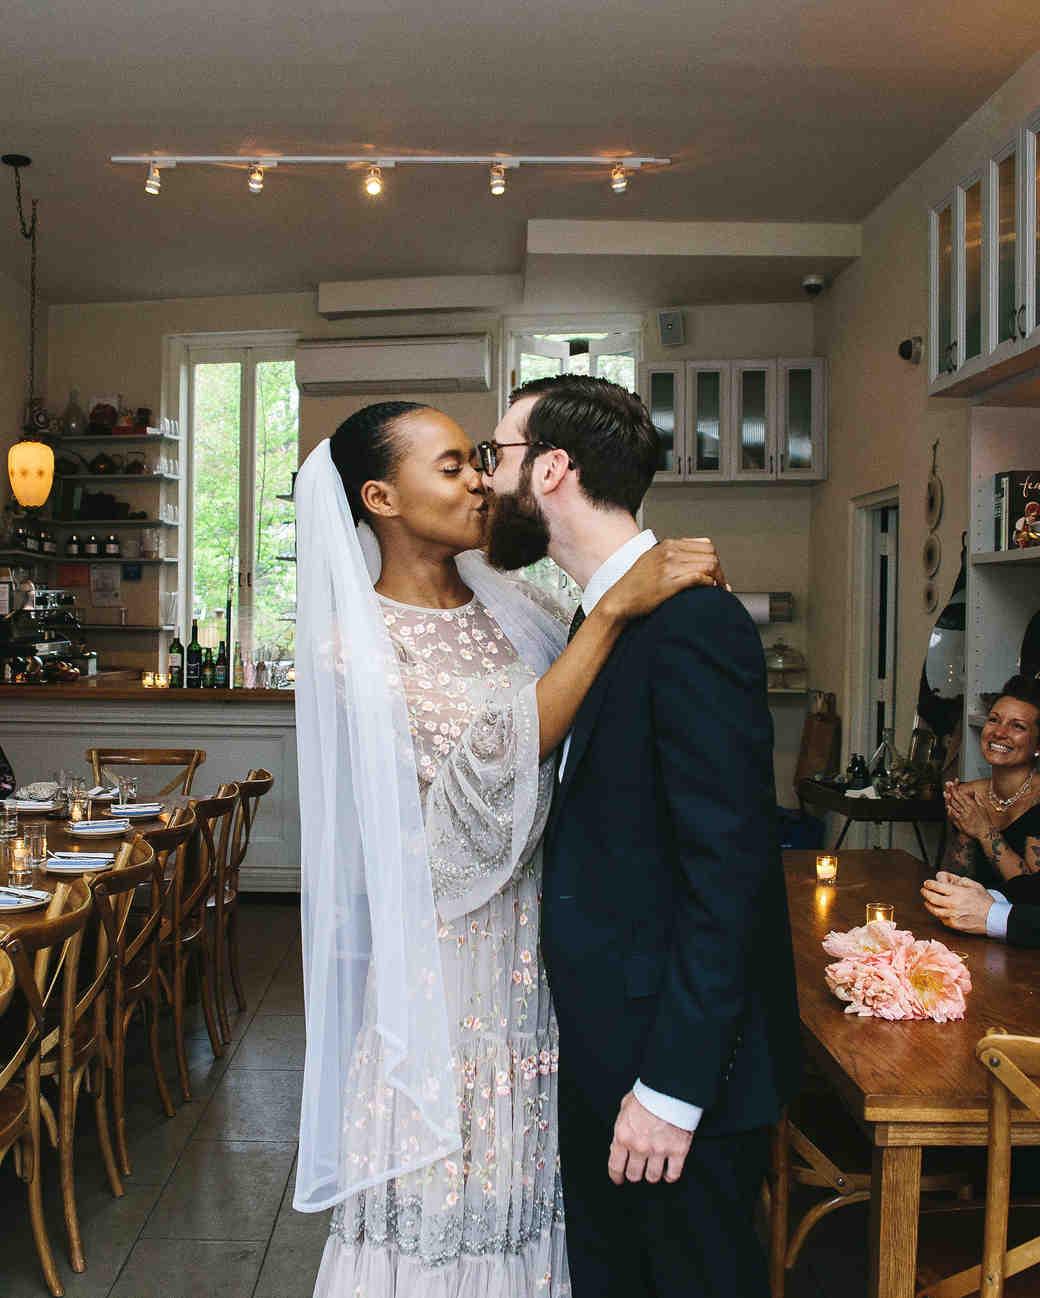 lola quinlan elopement ceremony kiss bride and groom